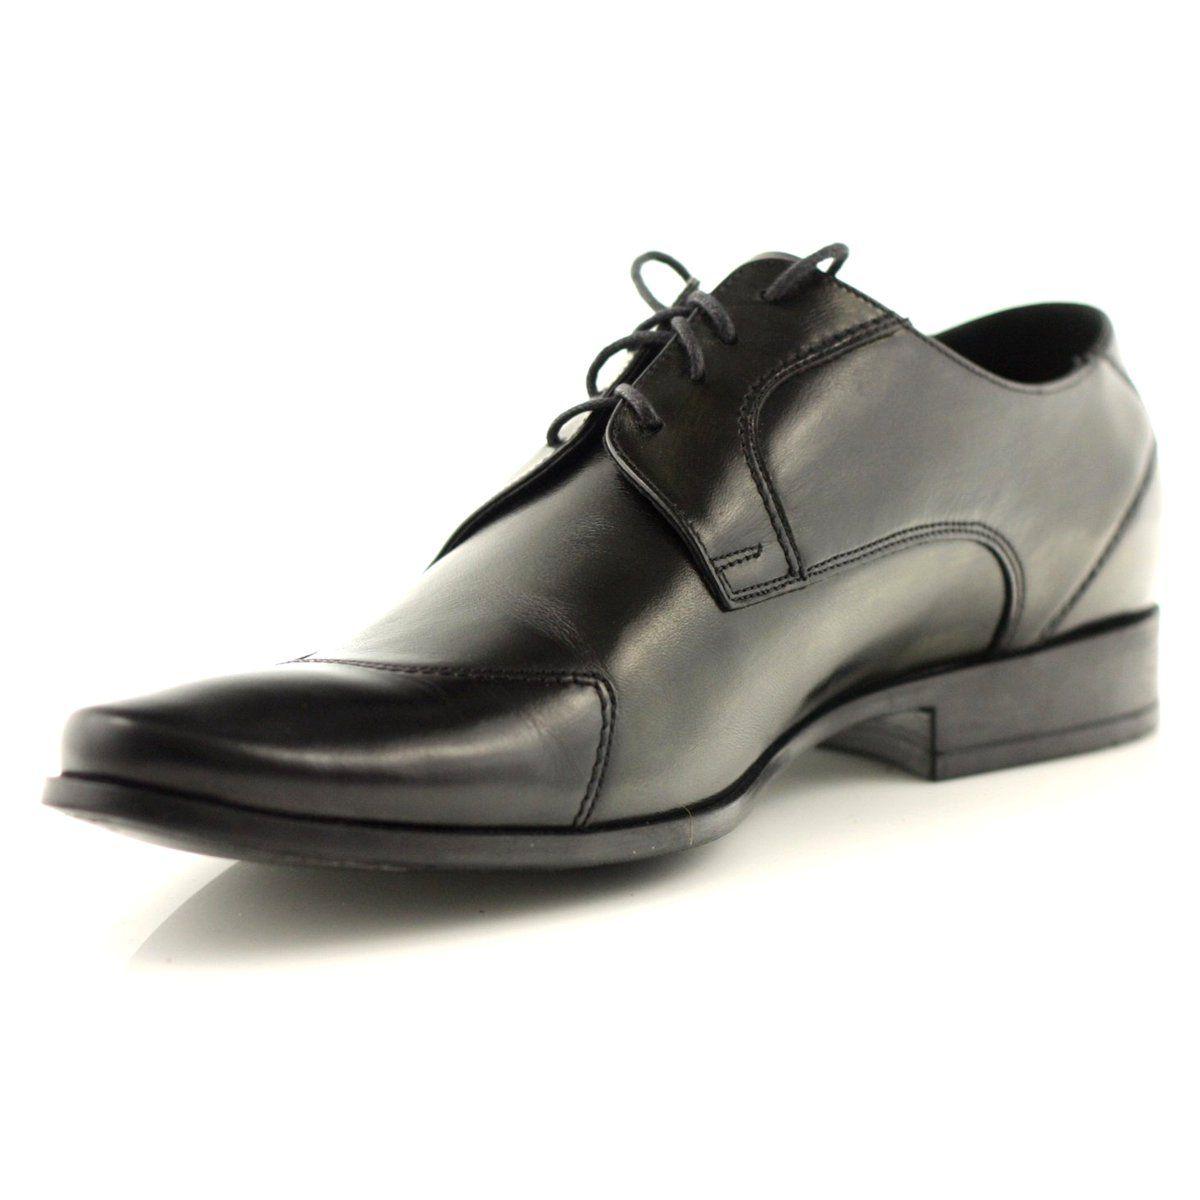 Polbuty Meskie Pilpol Polbuty Meskie Pilpol 1193 Czarne Dress Shoes Men Dress Shoes Oxford Shoes